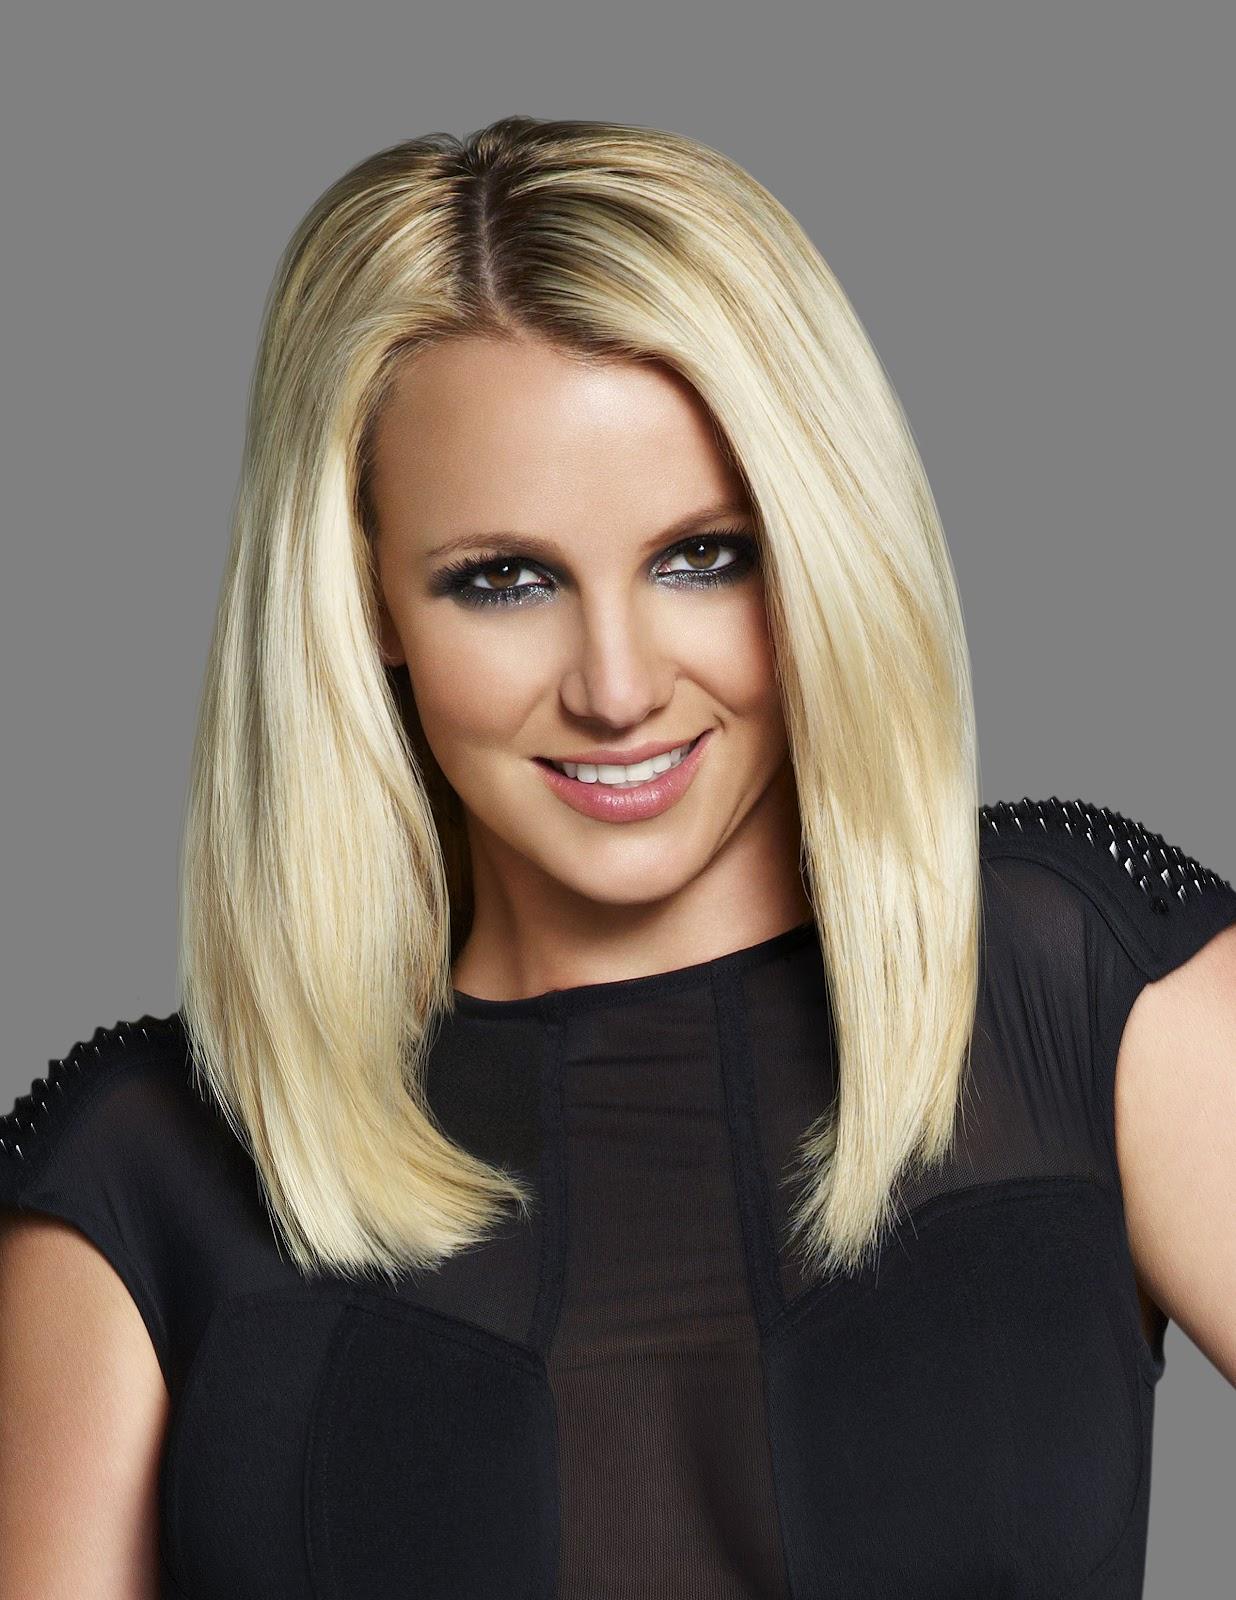 http://4.bp.blogspot.com/-201ZLlA8Rt4/UBI2D897rqI/AAAAAAAAQvw/_Sl4oV3dNGQ/s1600/Britney+Spears+&+Demi+Lovato+-+The+X+Factor+2012+Promos+01.jpg